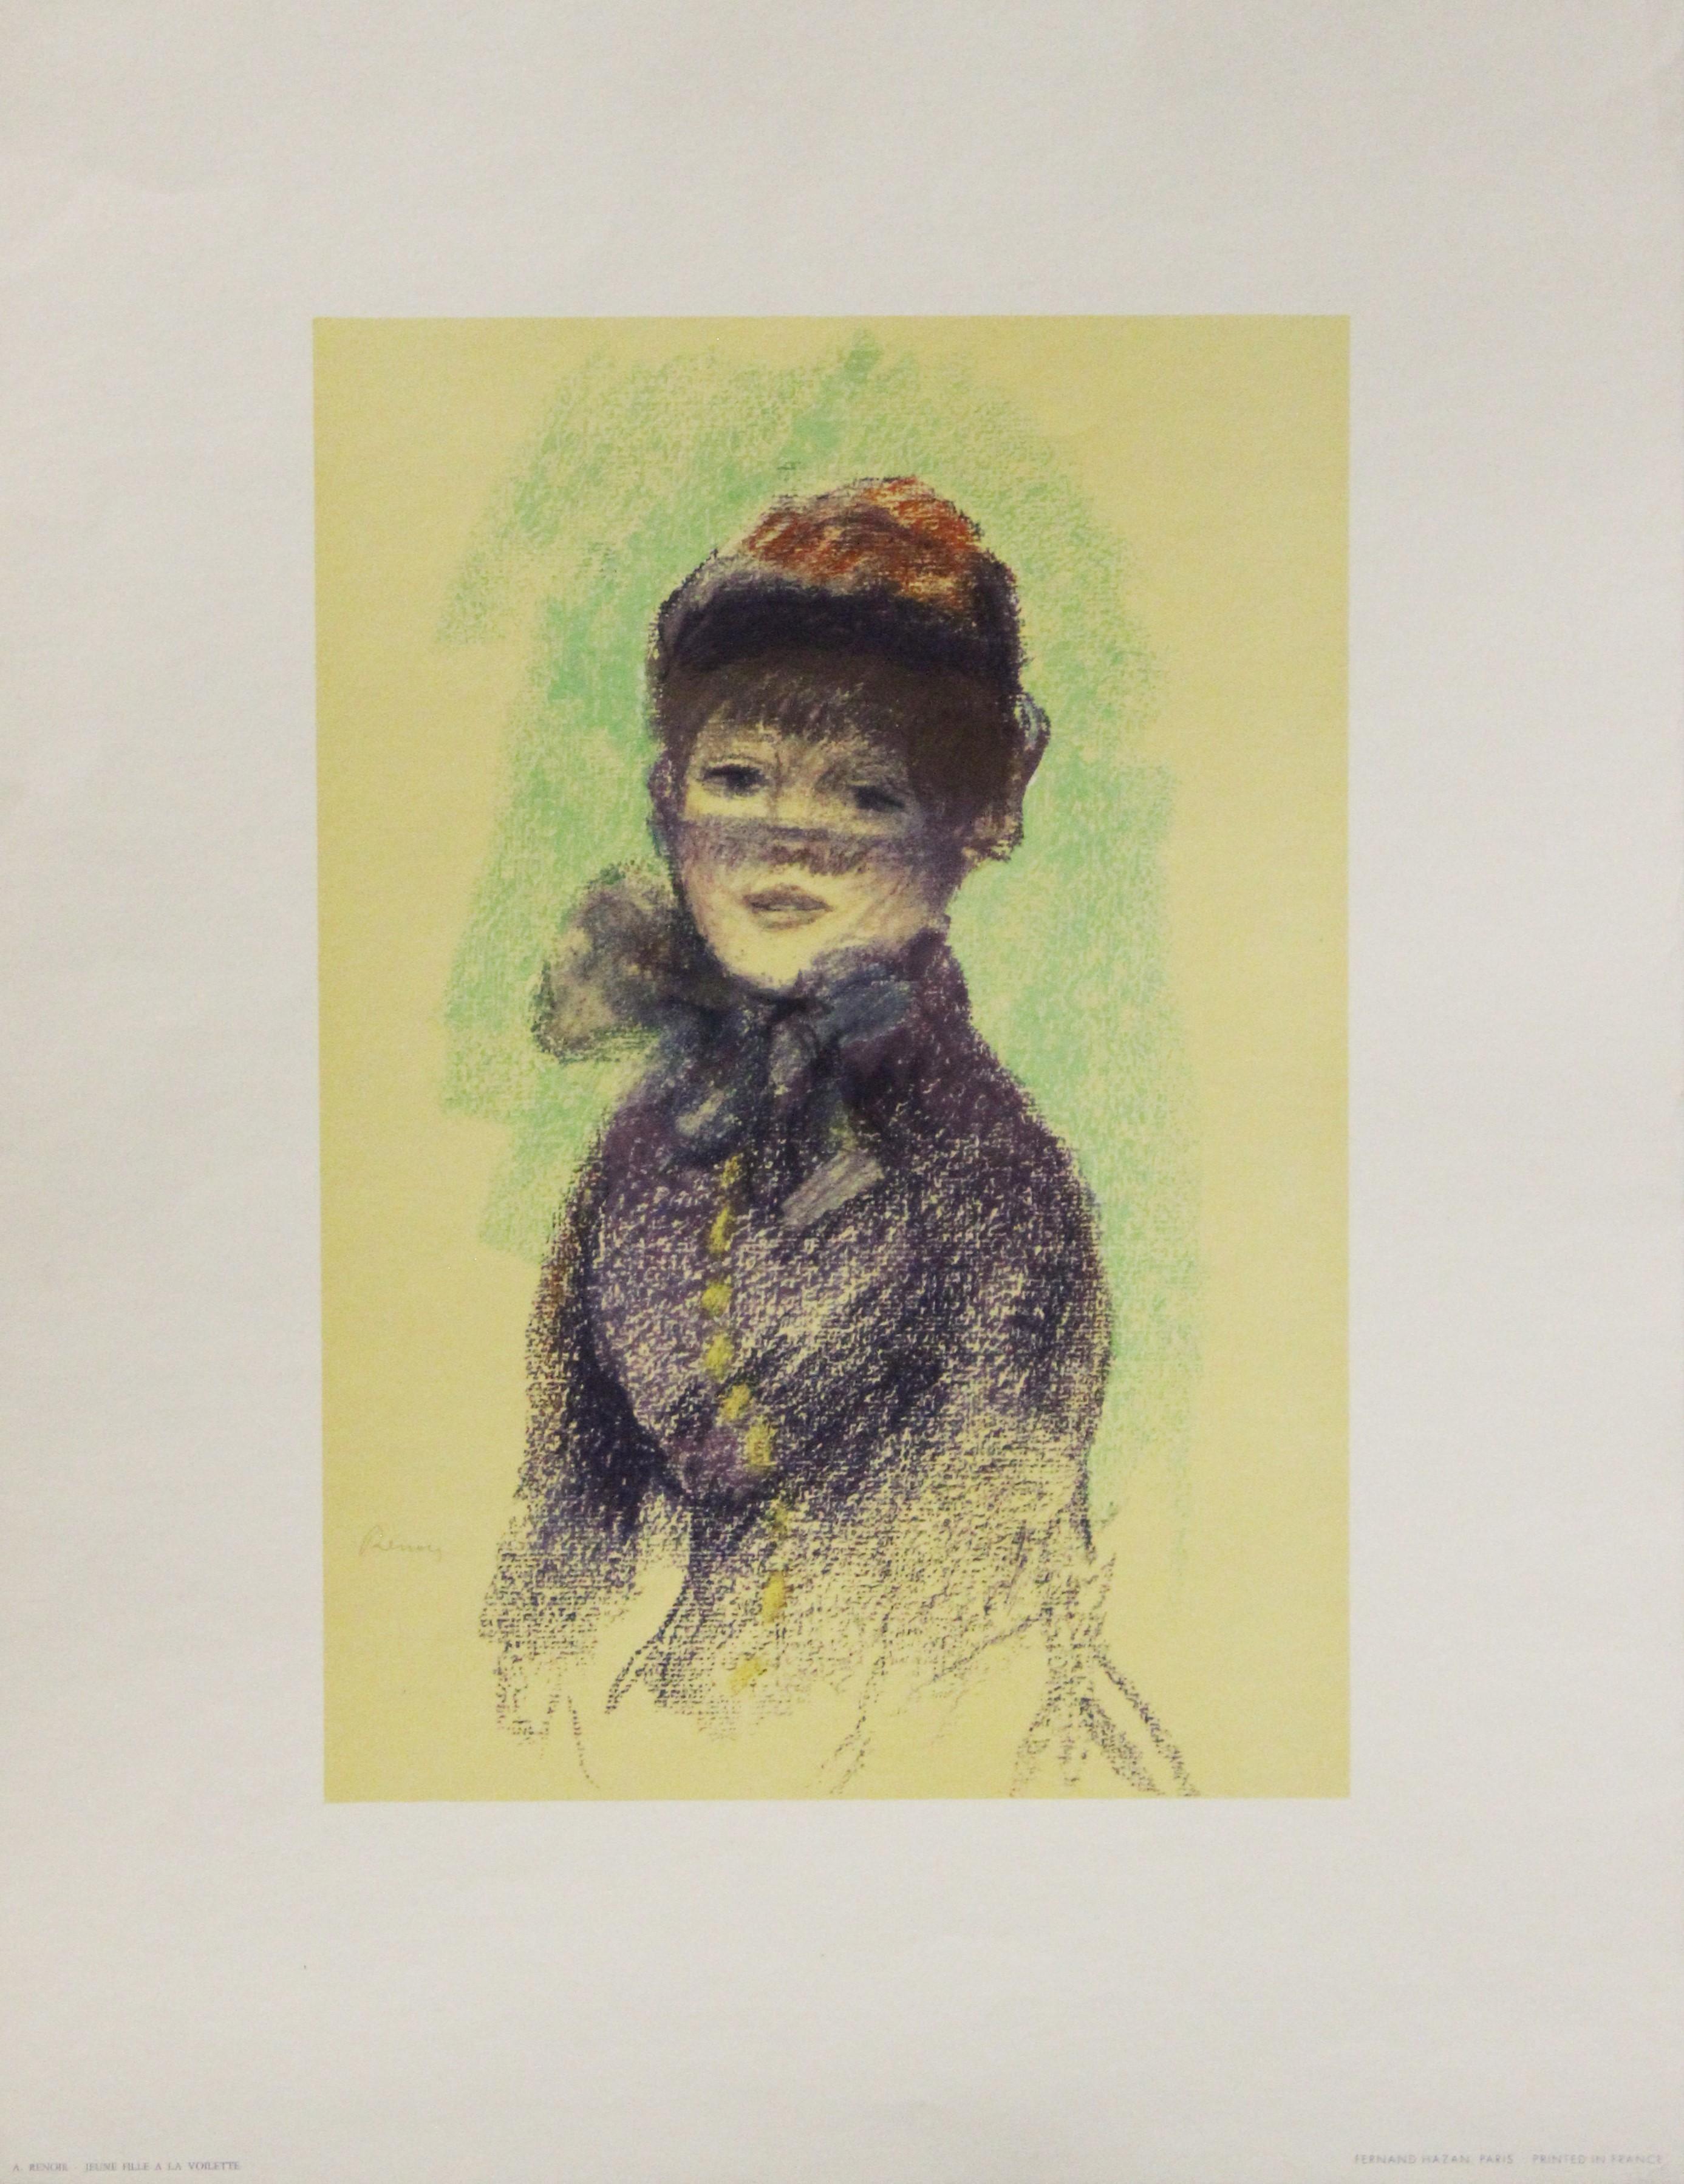 Jeune Fille A La Voilette-Poster. Printed in France.